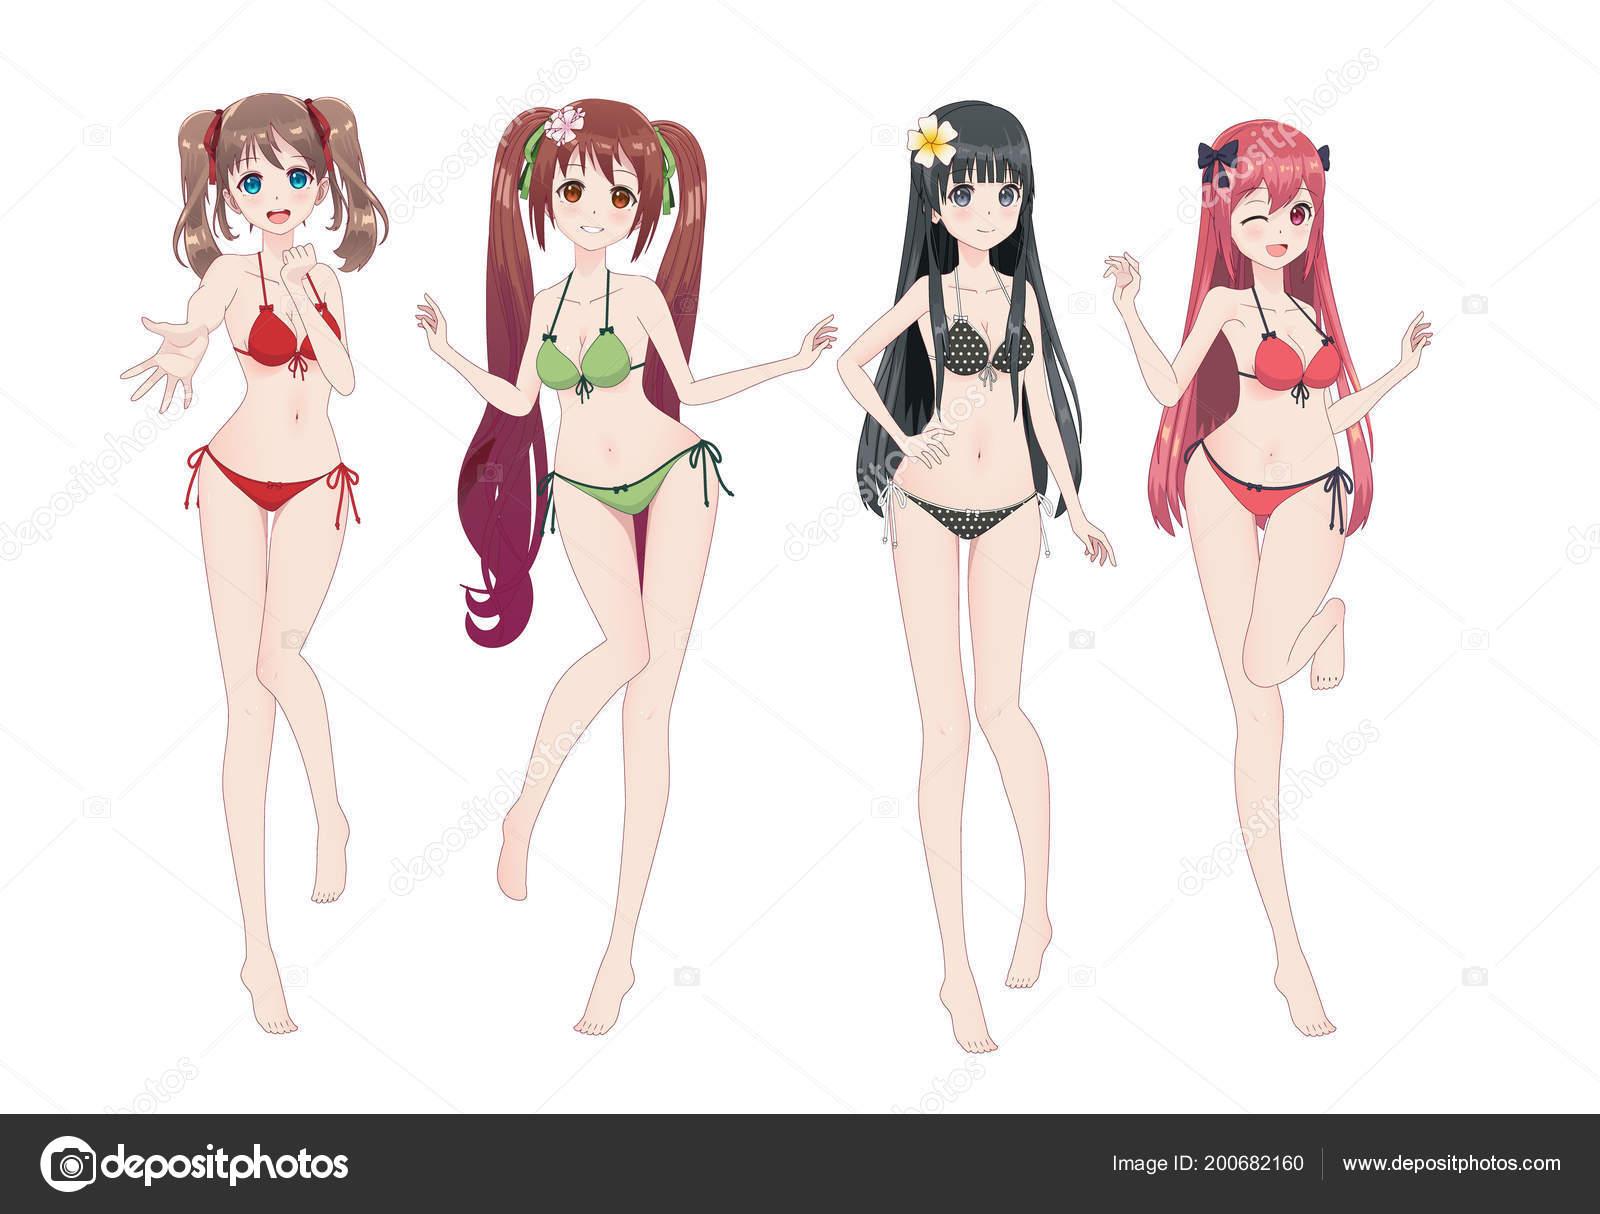 En Manga De Chicas Chica ImágenesPoses AnimeHermoso NXnwOP80k